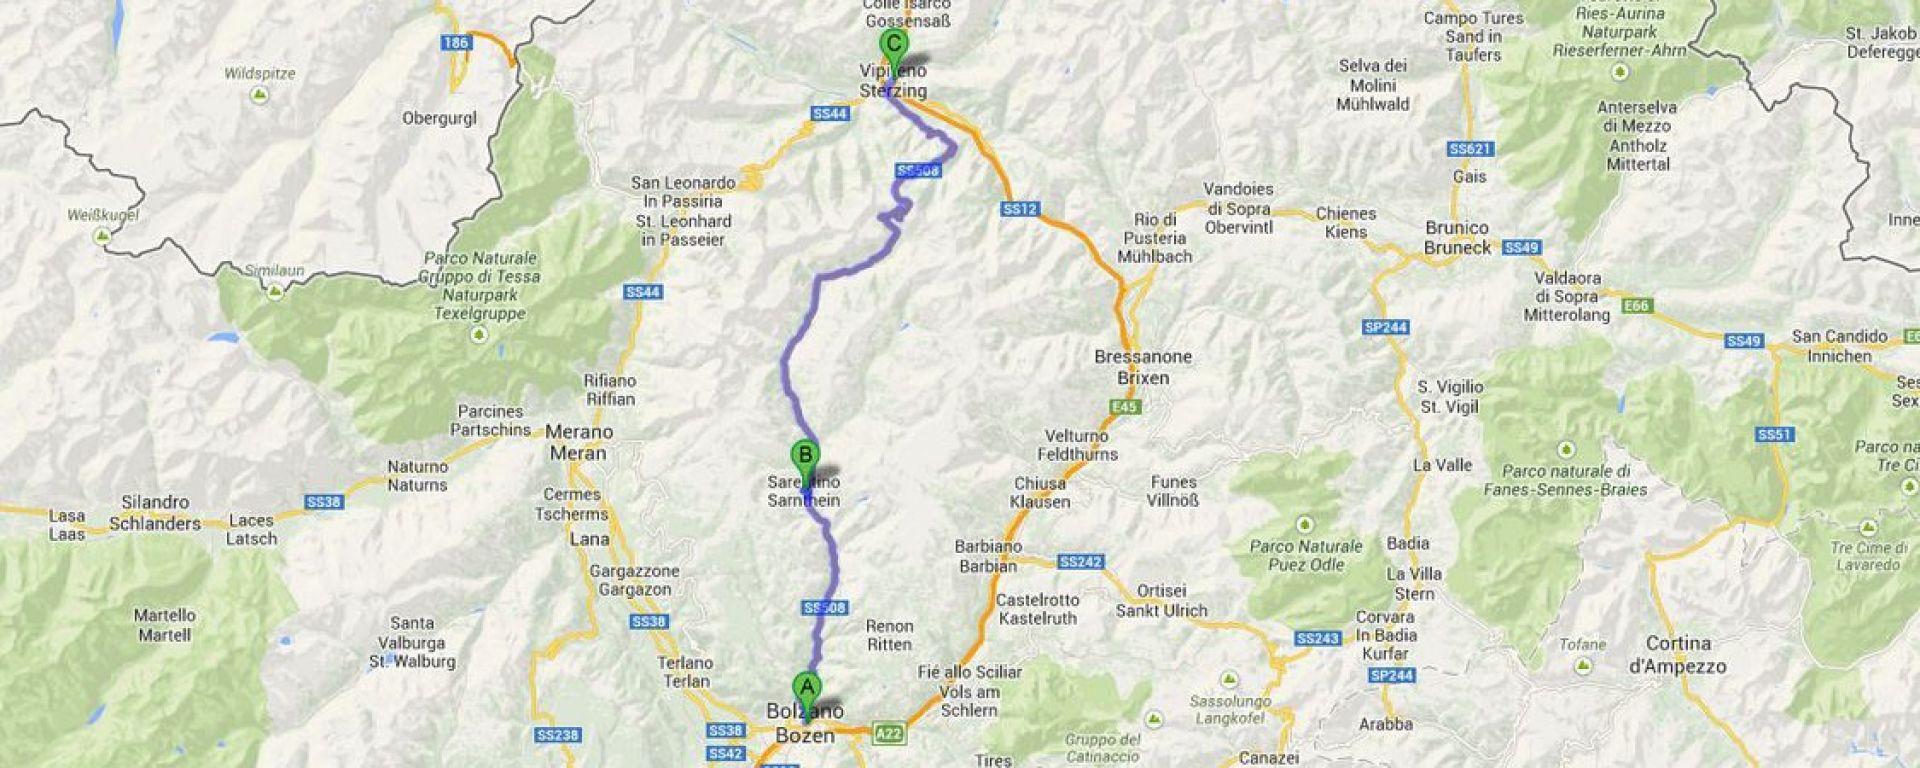 Bolzano - Sarentino - Vipiteno